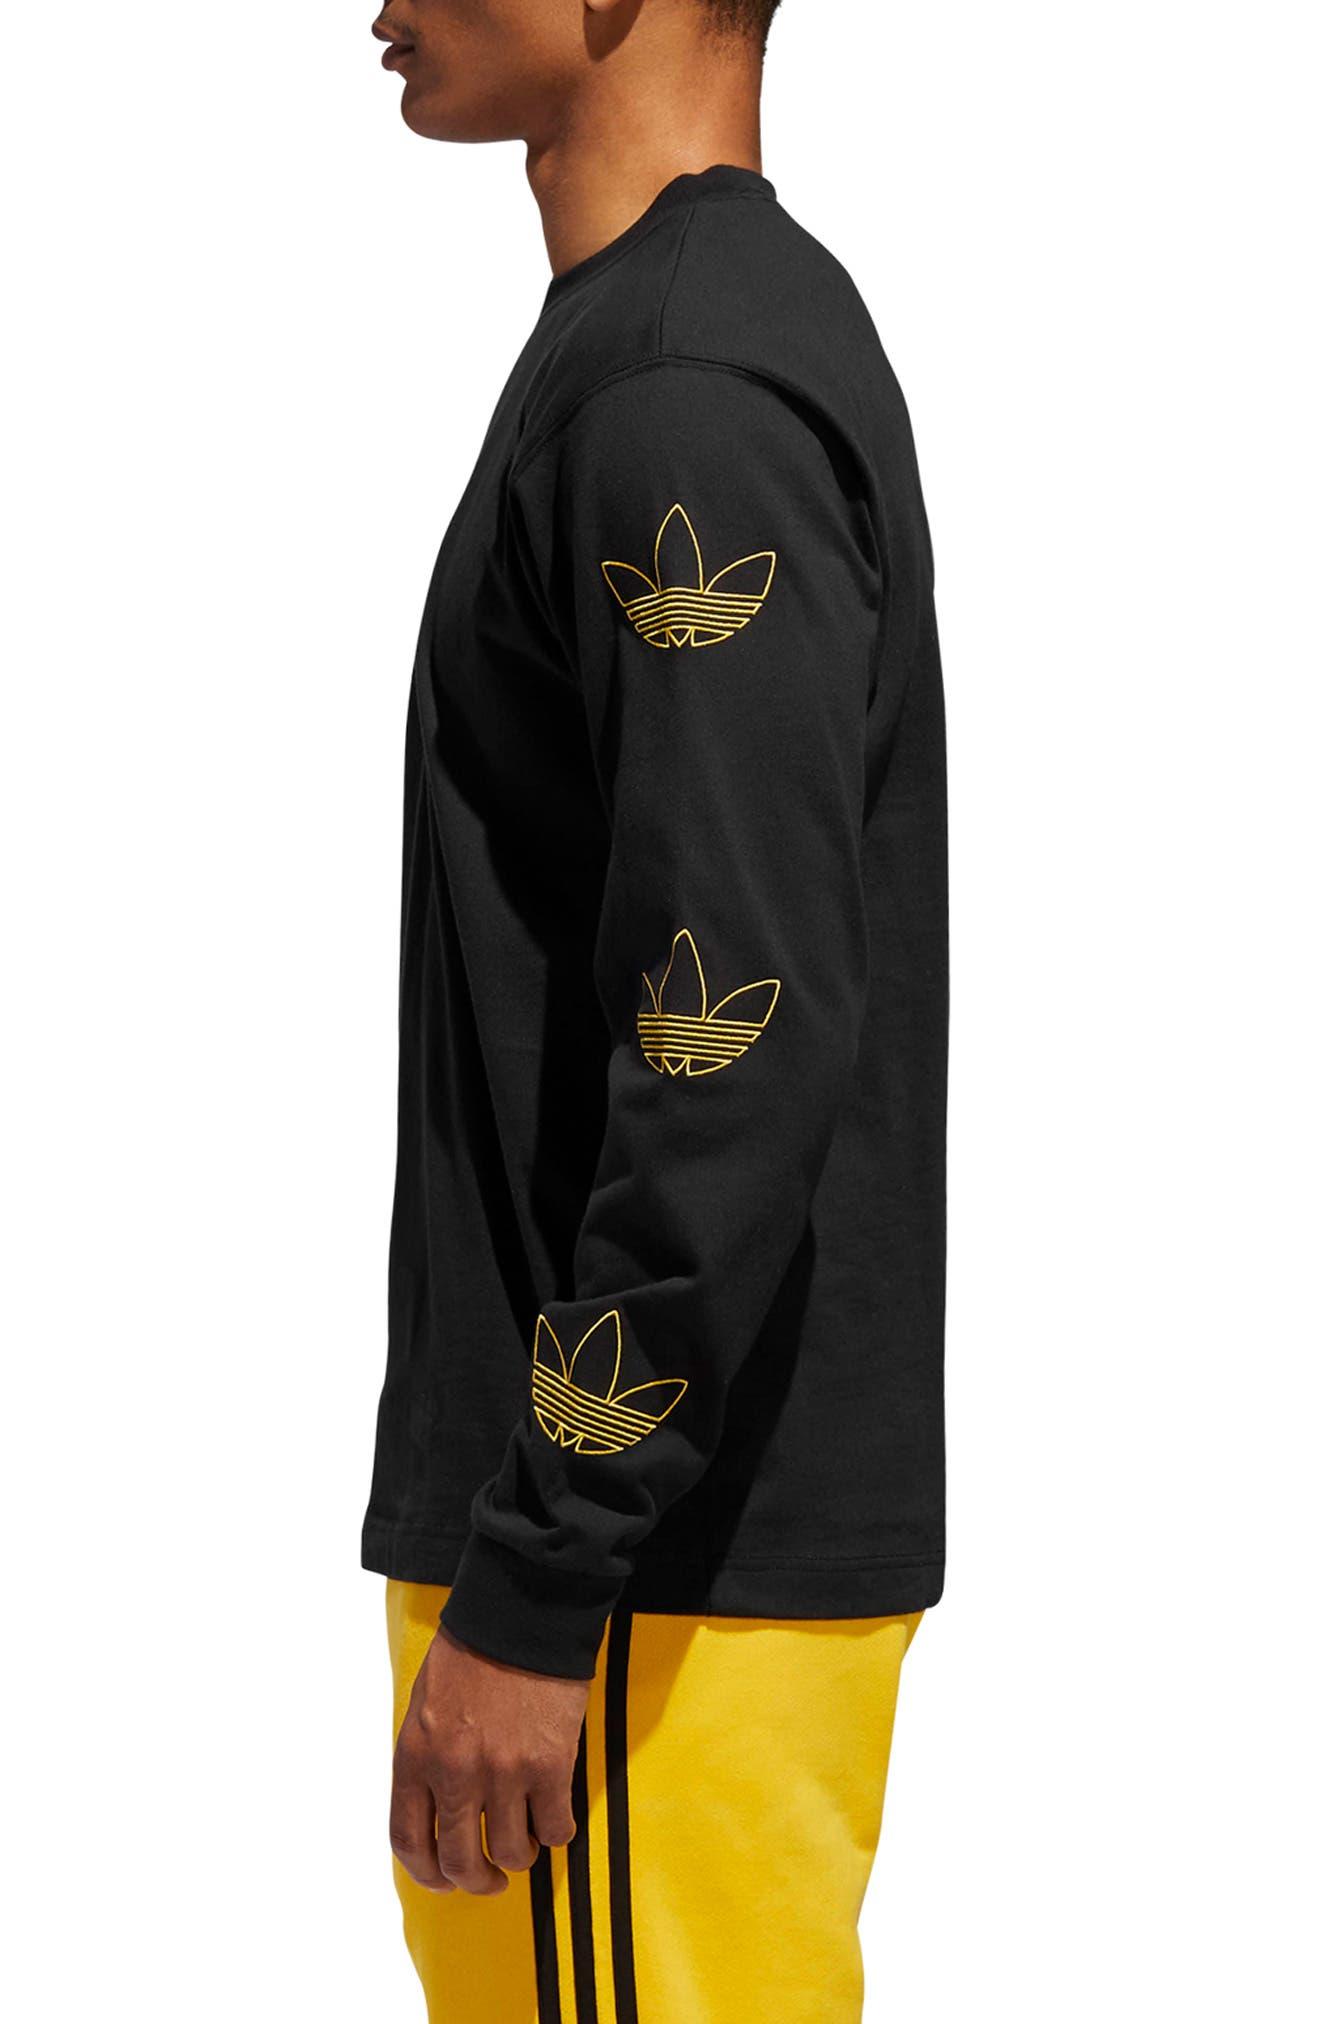 ADIDAS ORIGINALS, Embroidered Trefoil Long Sleeve T-Shirt, Alternate thumbnail 3, color, BLACK/ WHITE